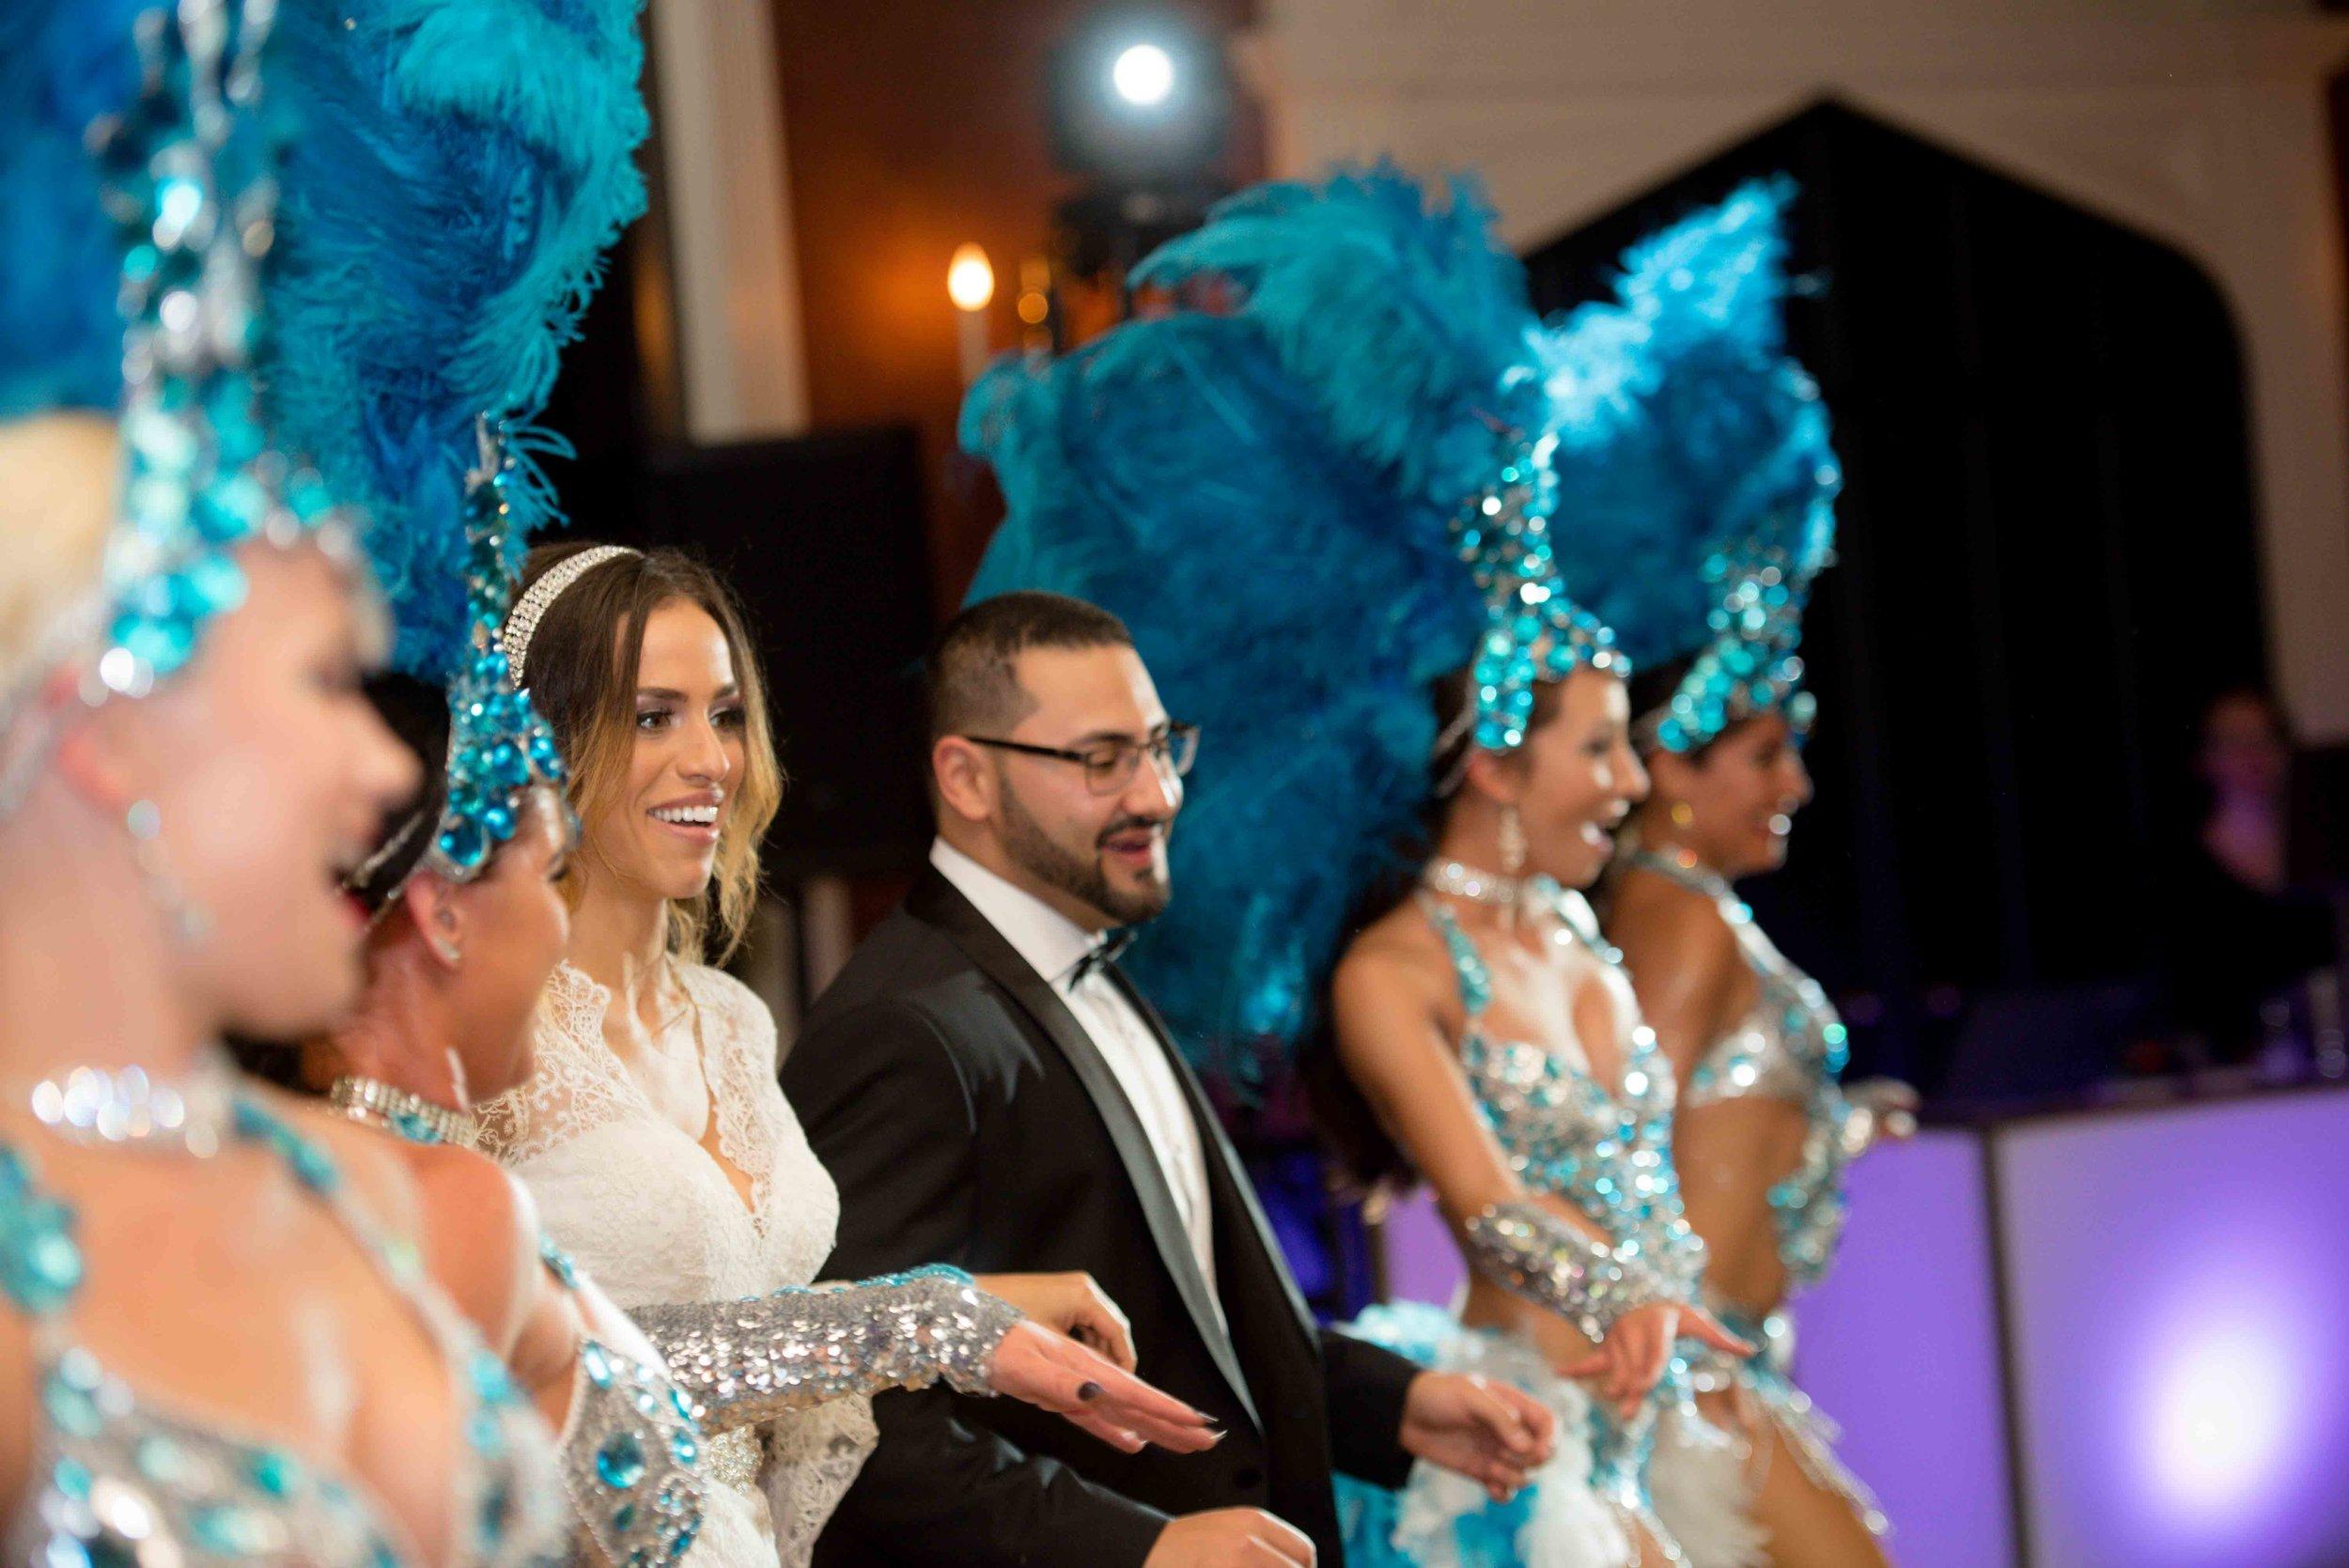 Brazilian Dancers at wedding in Toronto